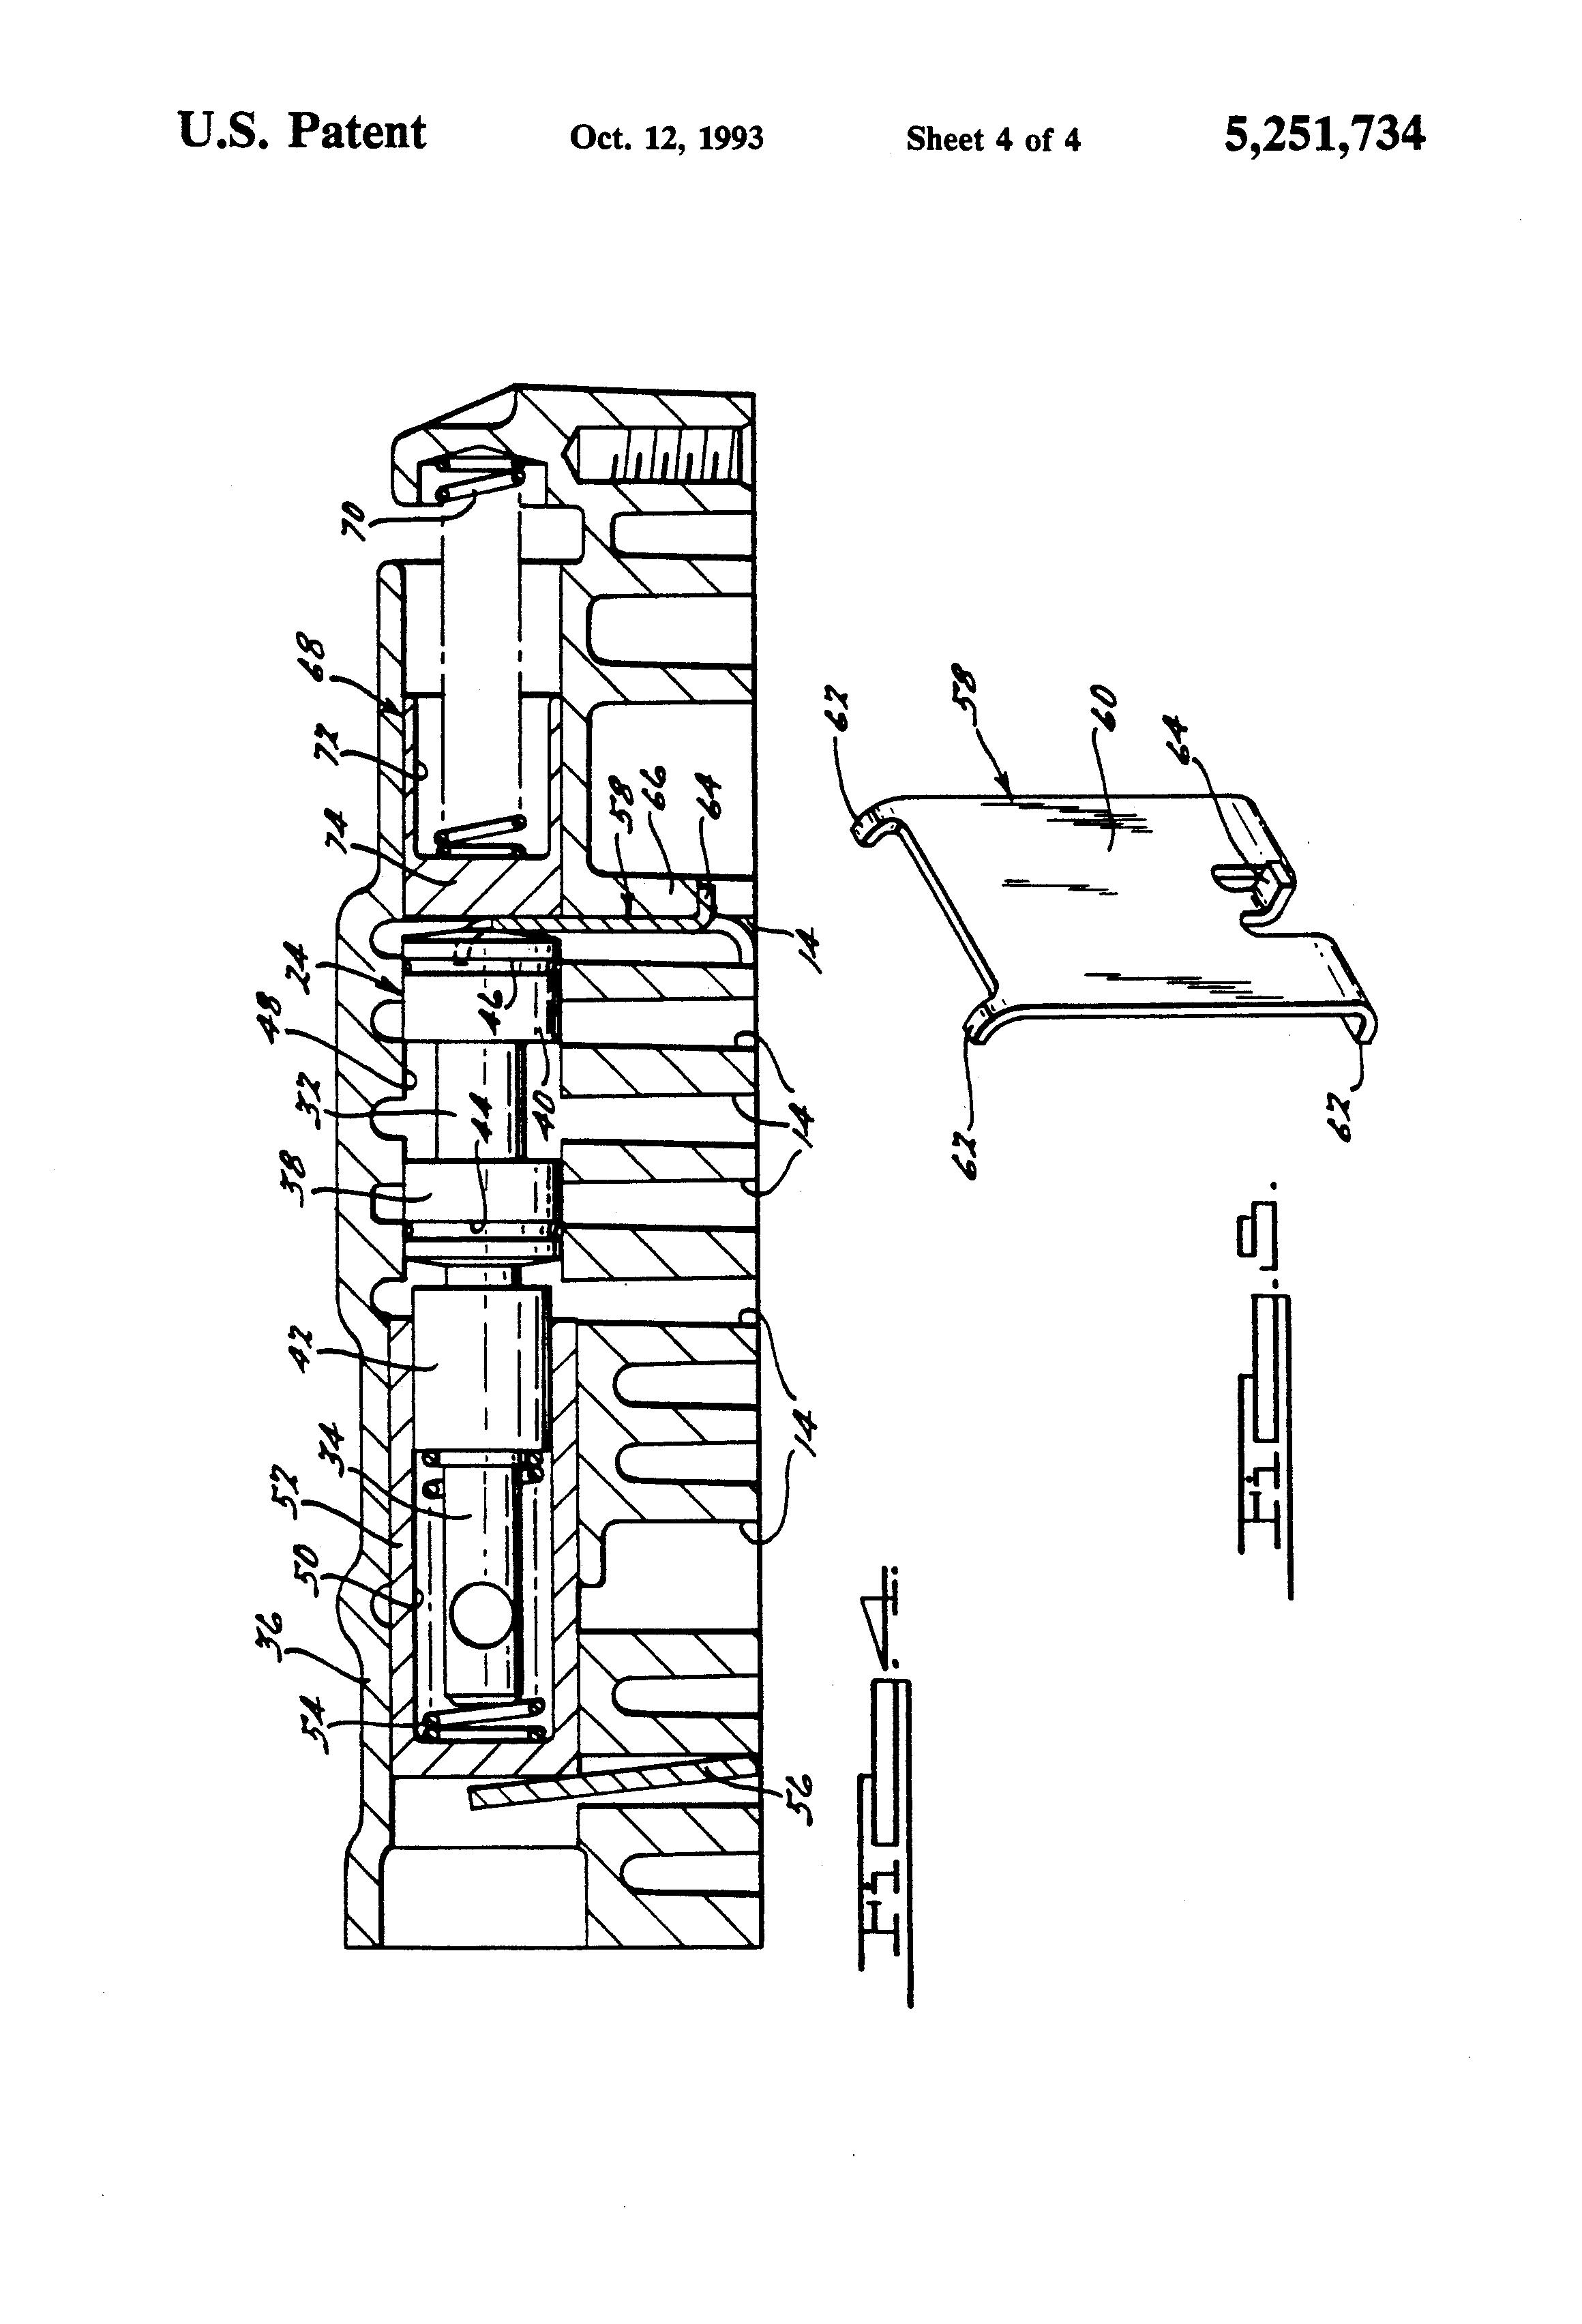 Cb 5927 Wiring Diagram 1981 Corvette In Addition 700r4 Lockup Wiring Diagram Schematic Wiring